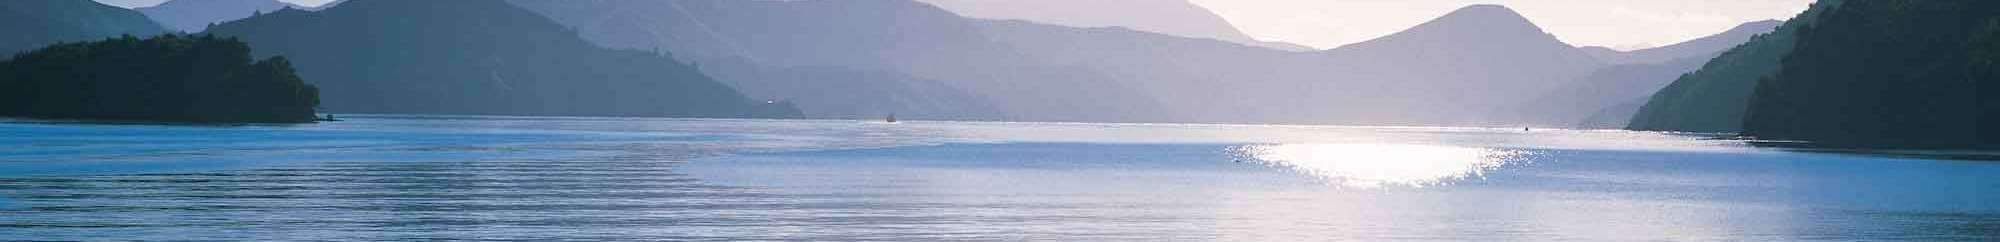 Marlborough Sounds Boat Journey